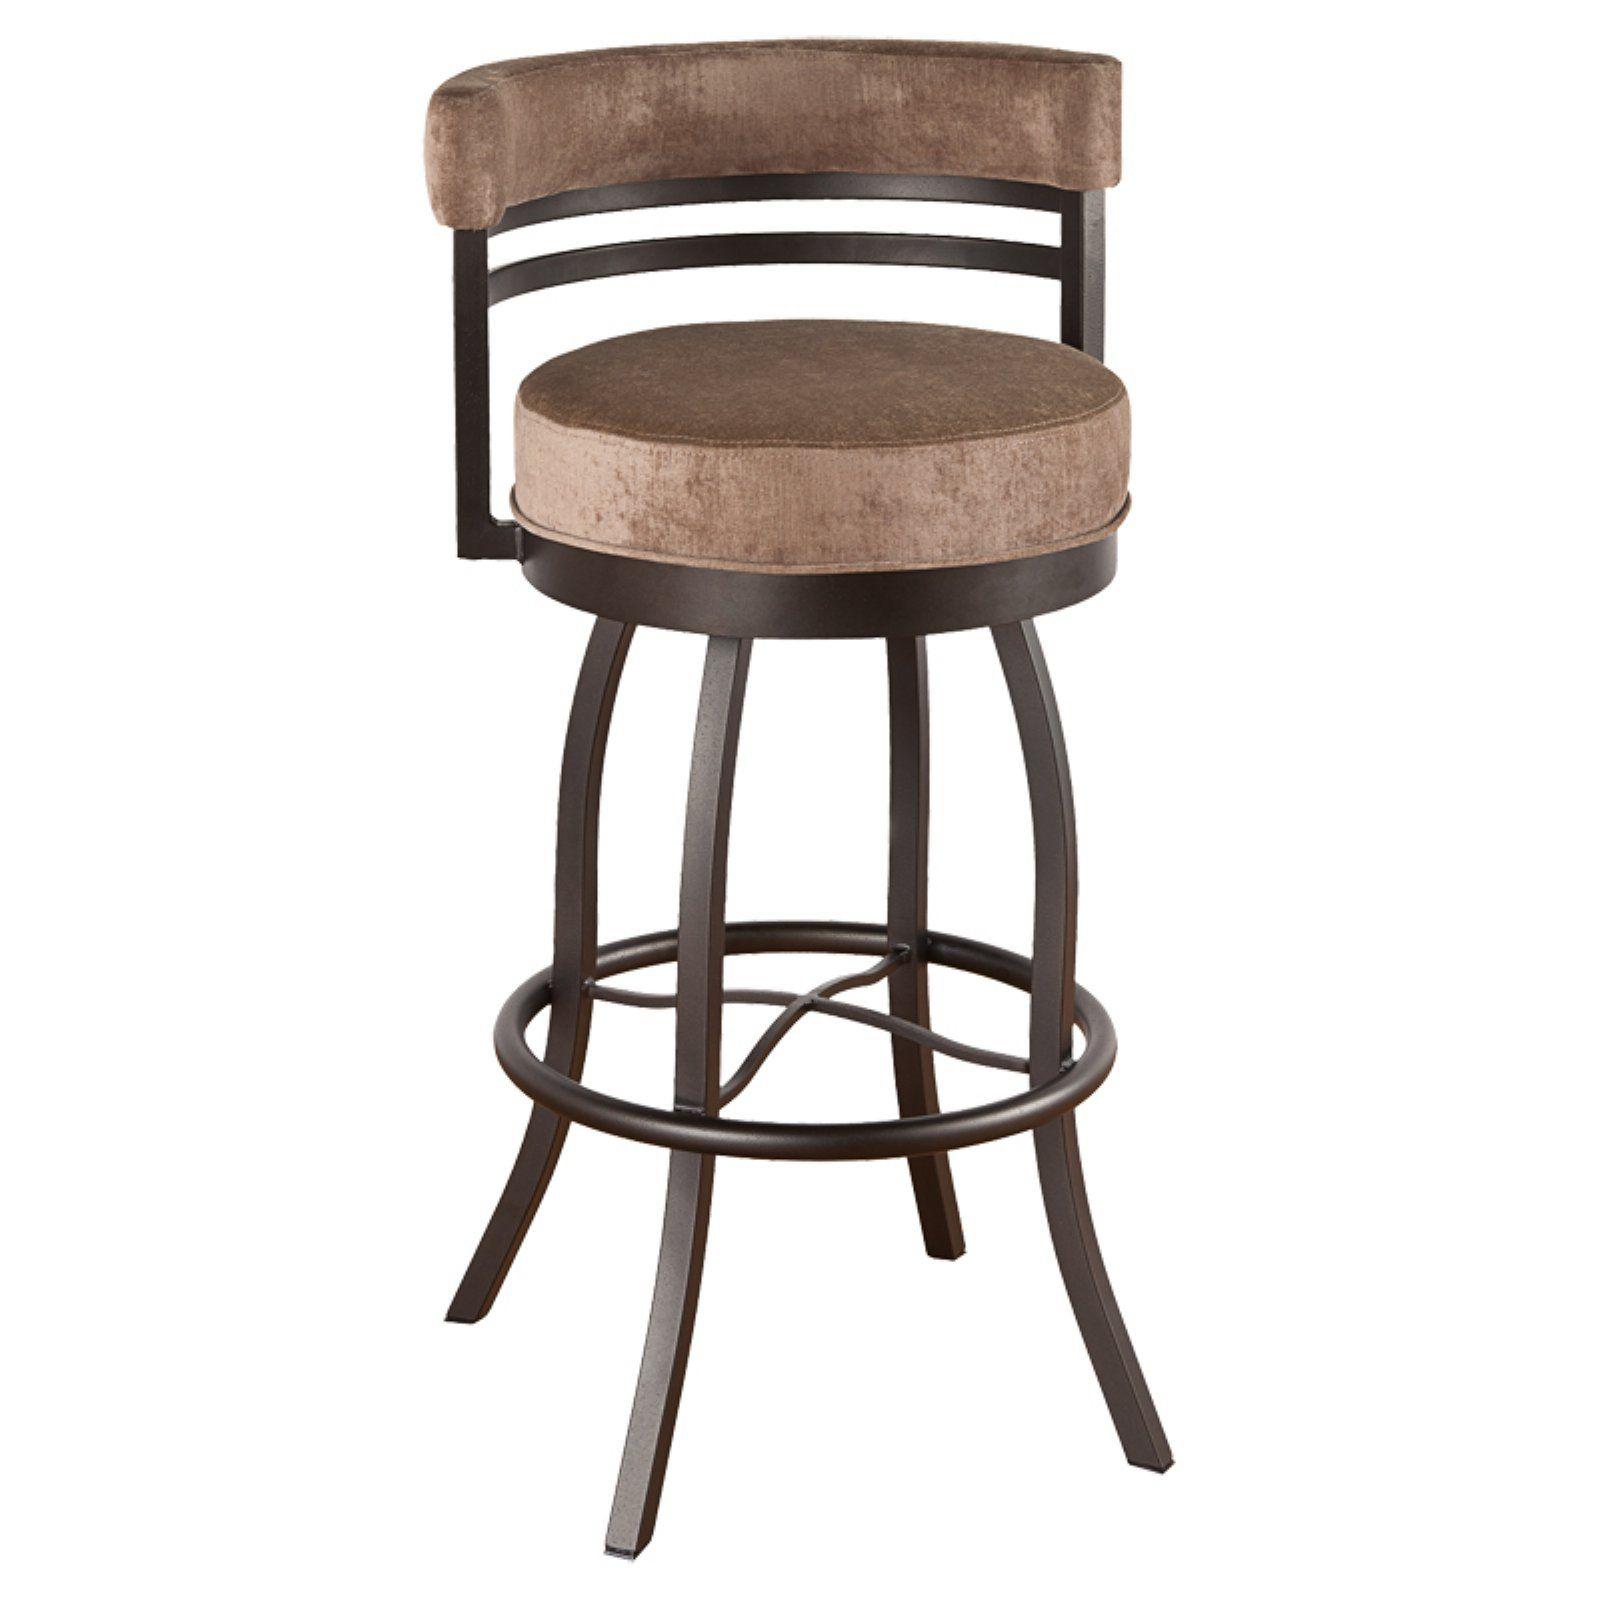 Callee Inc Americana 34 In Swivel Barstool With Cushion Bar Stools Bar Stools For Sale Swivel Bar Stools